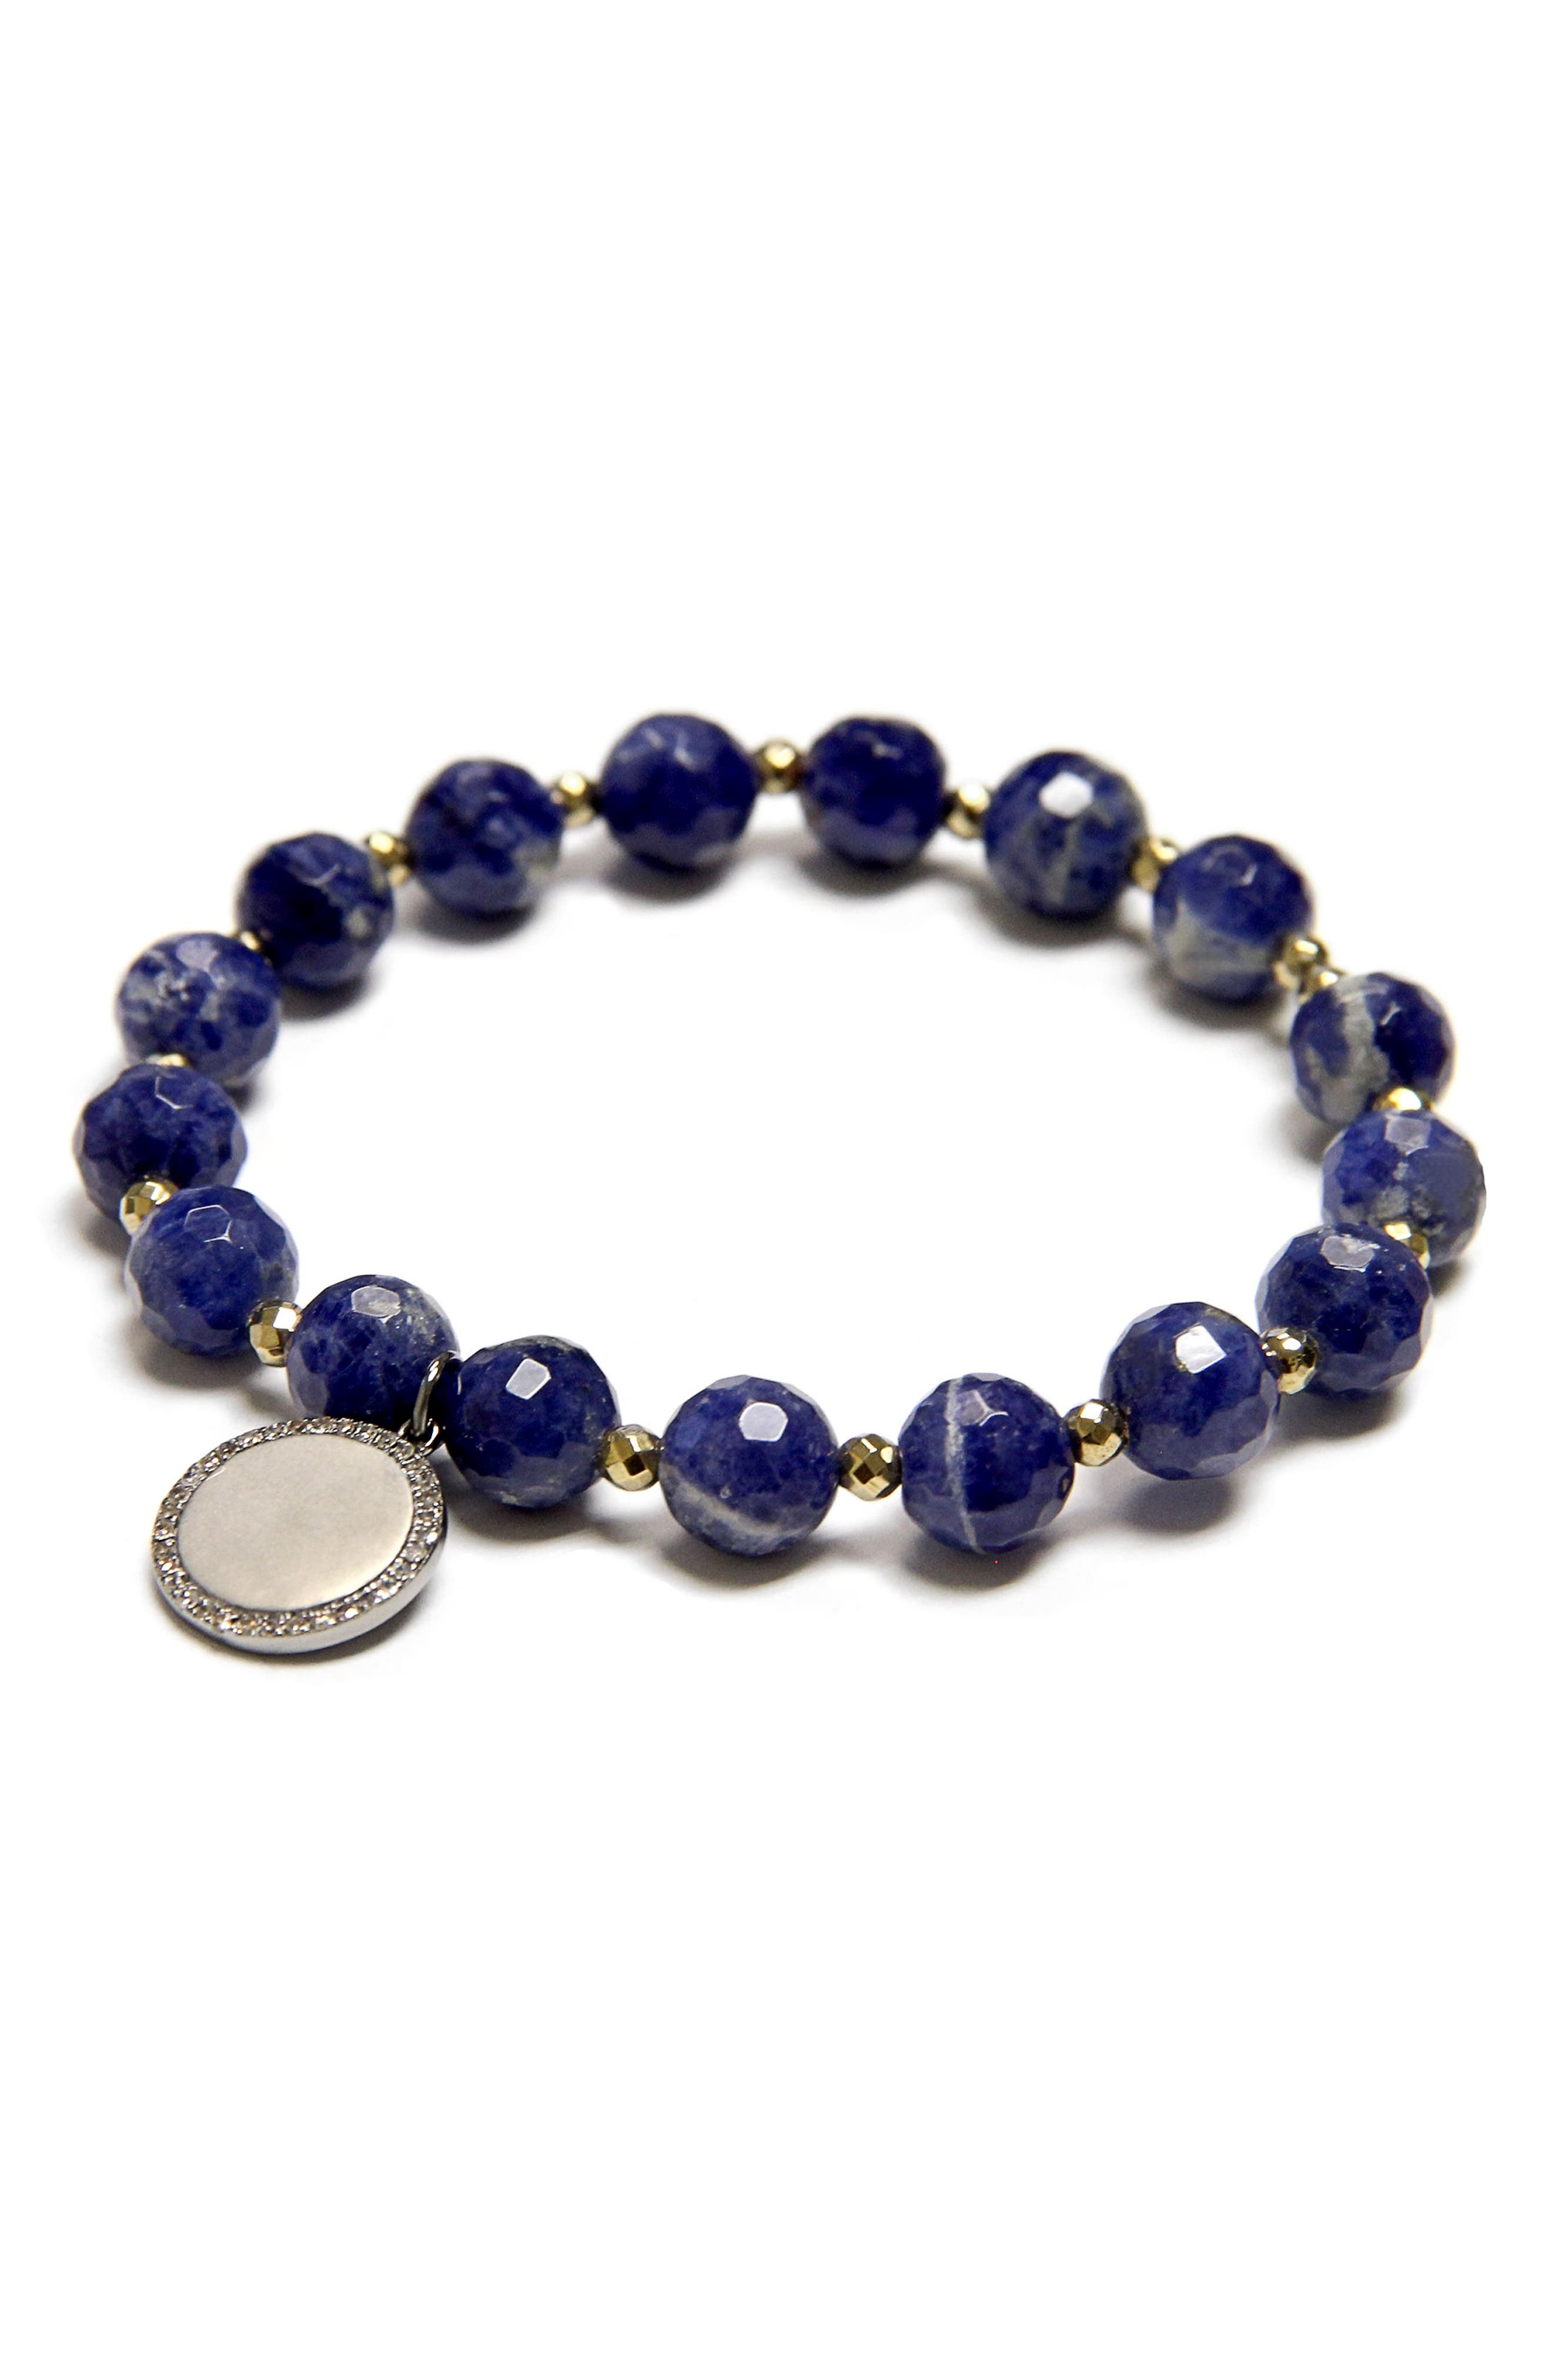 Alternate Image 1 Selected - Jane Basch Bead Stretch Bracelet